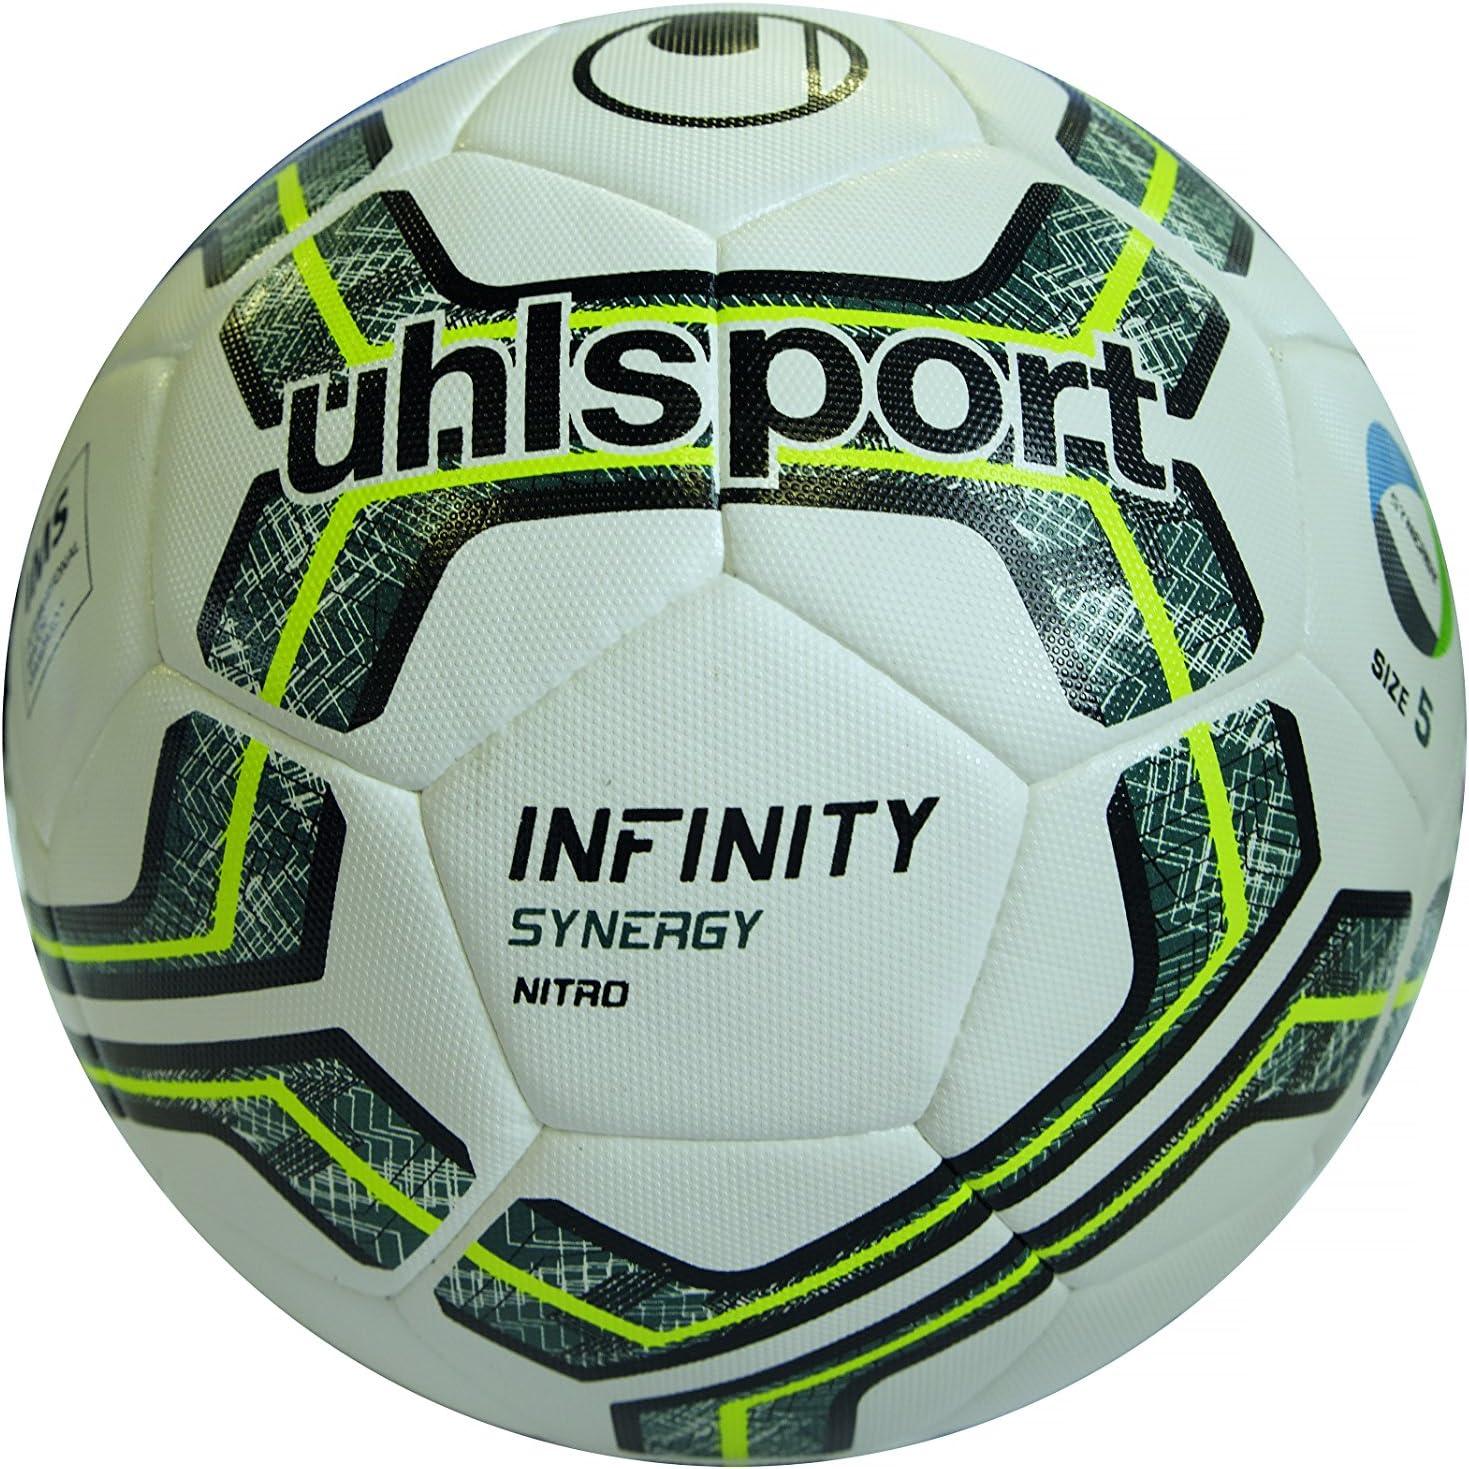 uhlsport Infinity Synergy Nitro 2.0 Balones de Fútbol, niños ...